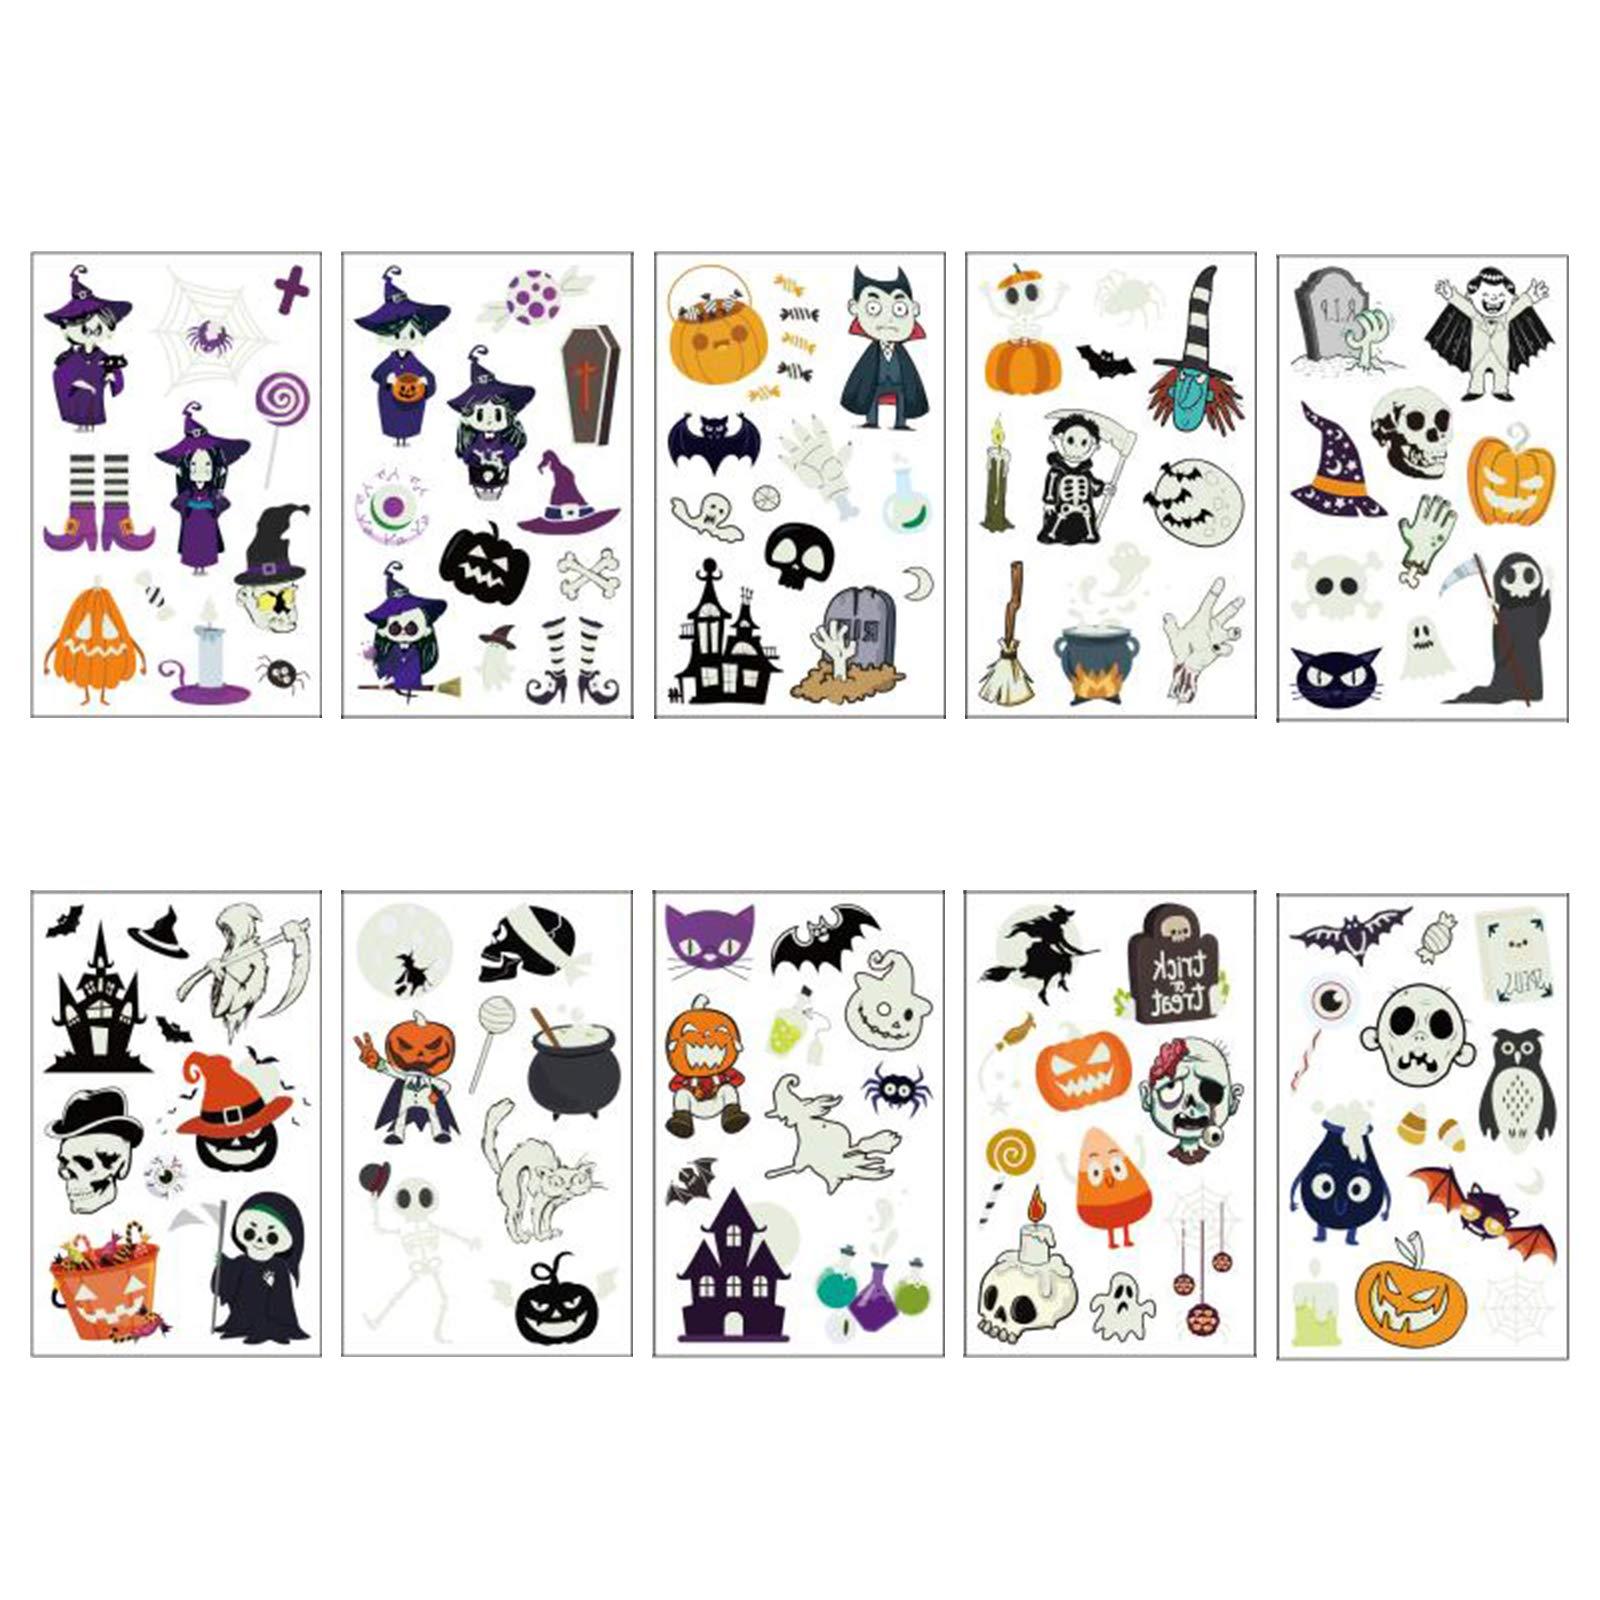 TAZEMAT 10 Blatt Halloween Temporäre Tattoos Fluoreszierende wasserdichte Tattoos Temporär Tätowierung Kürbis Geist Fledermaus Kunst Tattoos Kindertattoos Jungs Mädchen Halloween Party